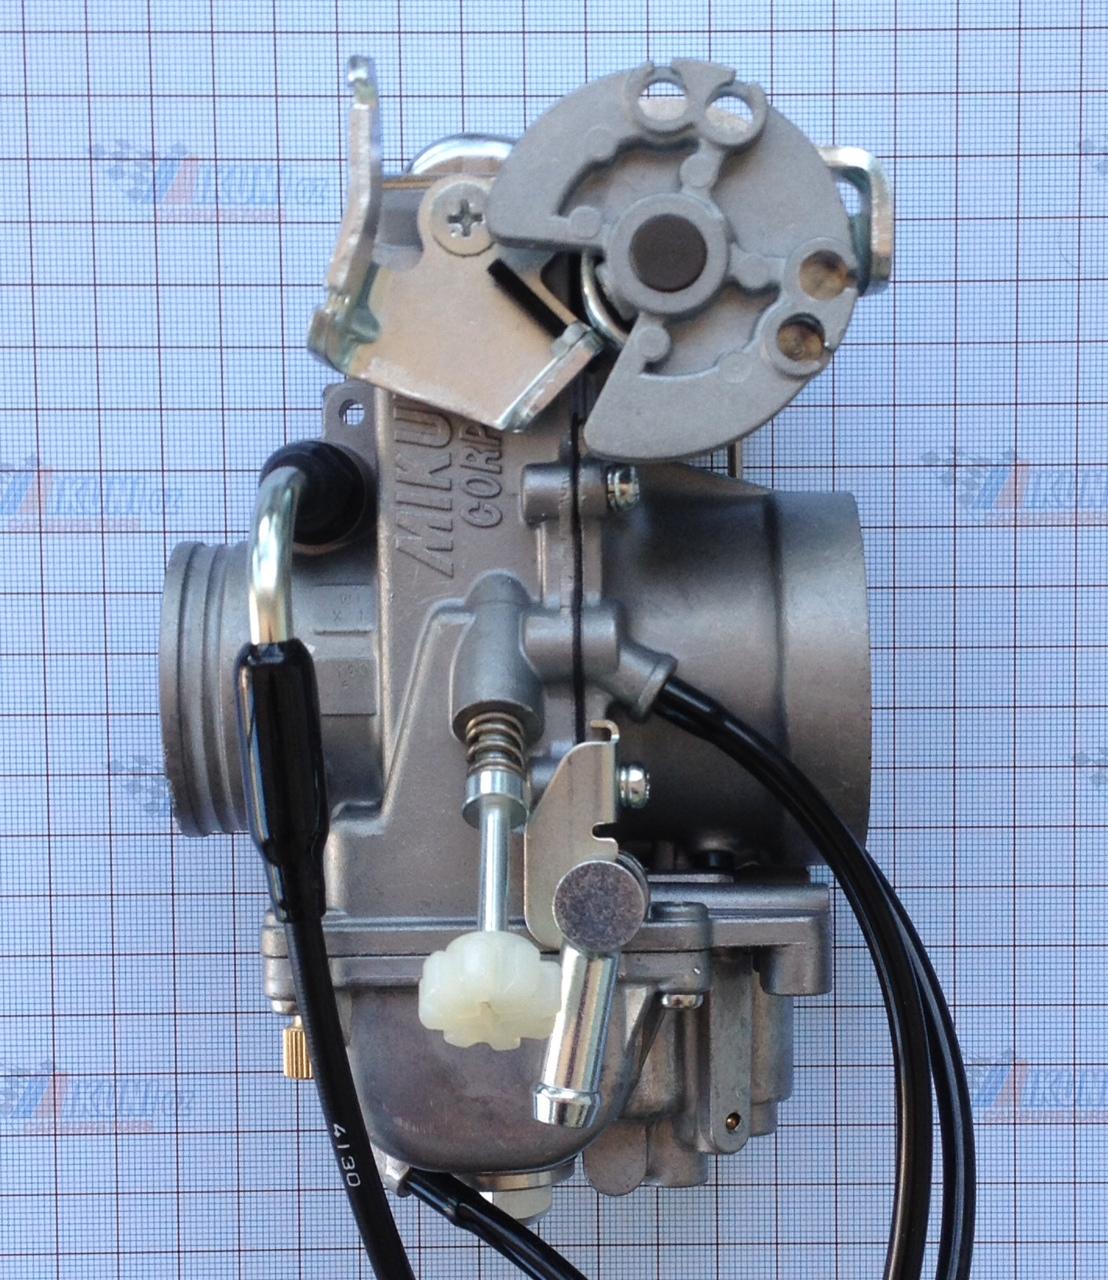 1 Tm40 6 Mikuni 40mm Flatslide Carb W Accelerator Pump Davidson Cv Carburetor Diagram Get Free Image About Wiring